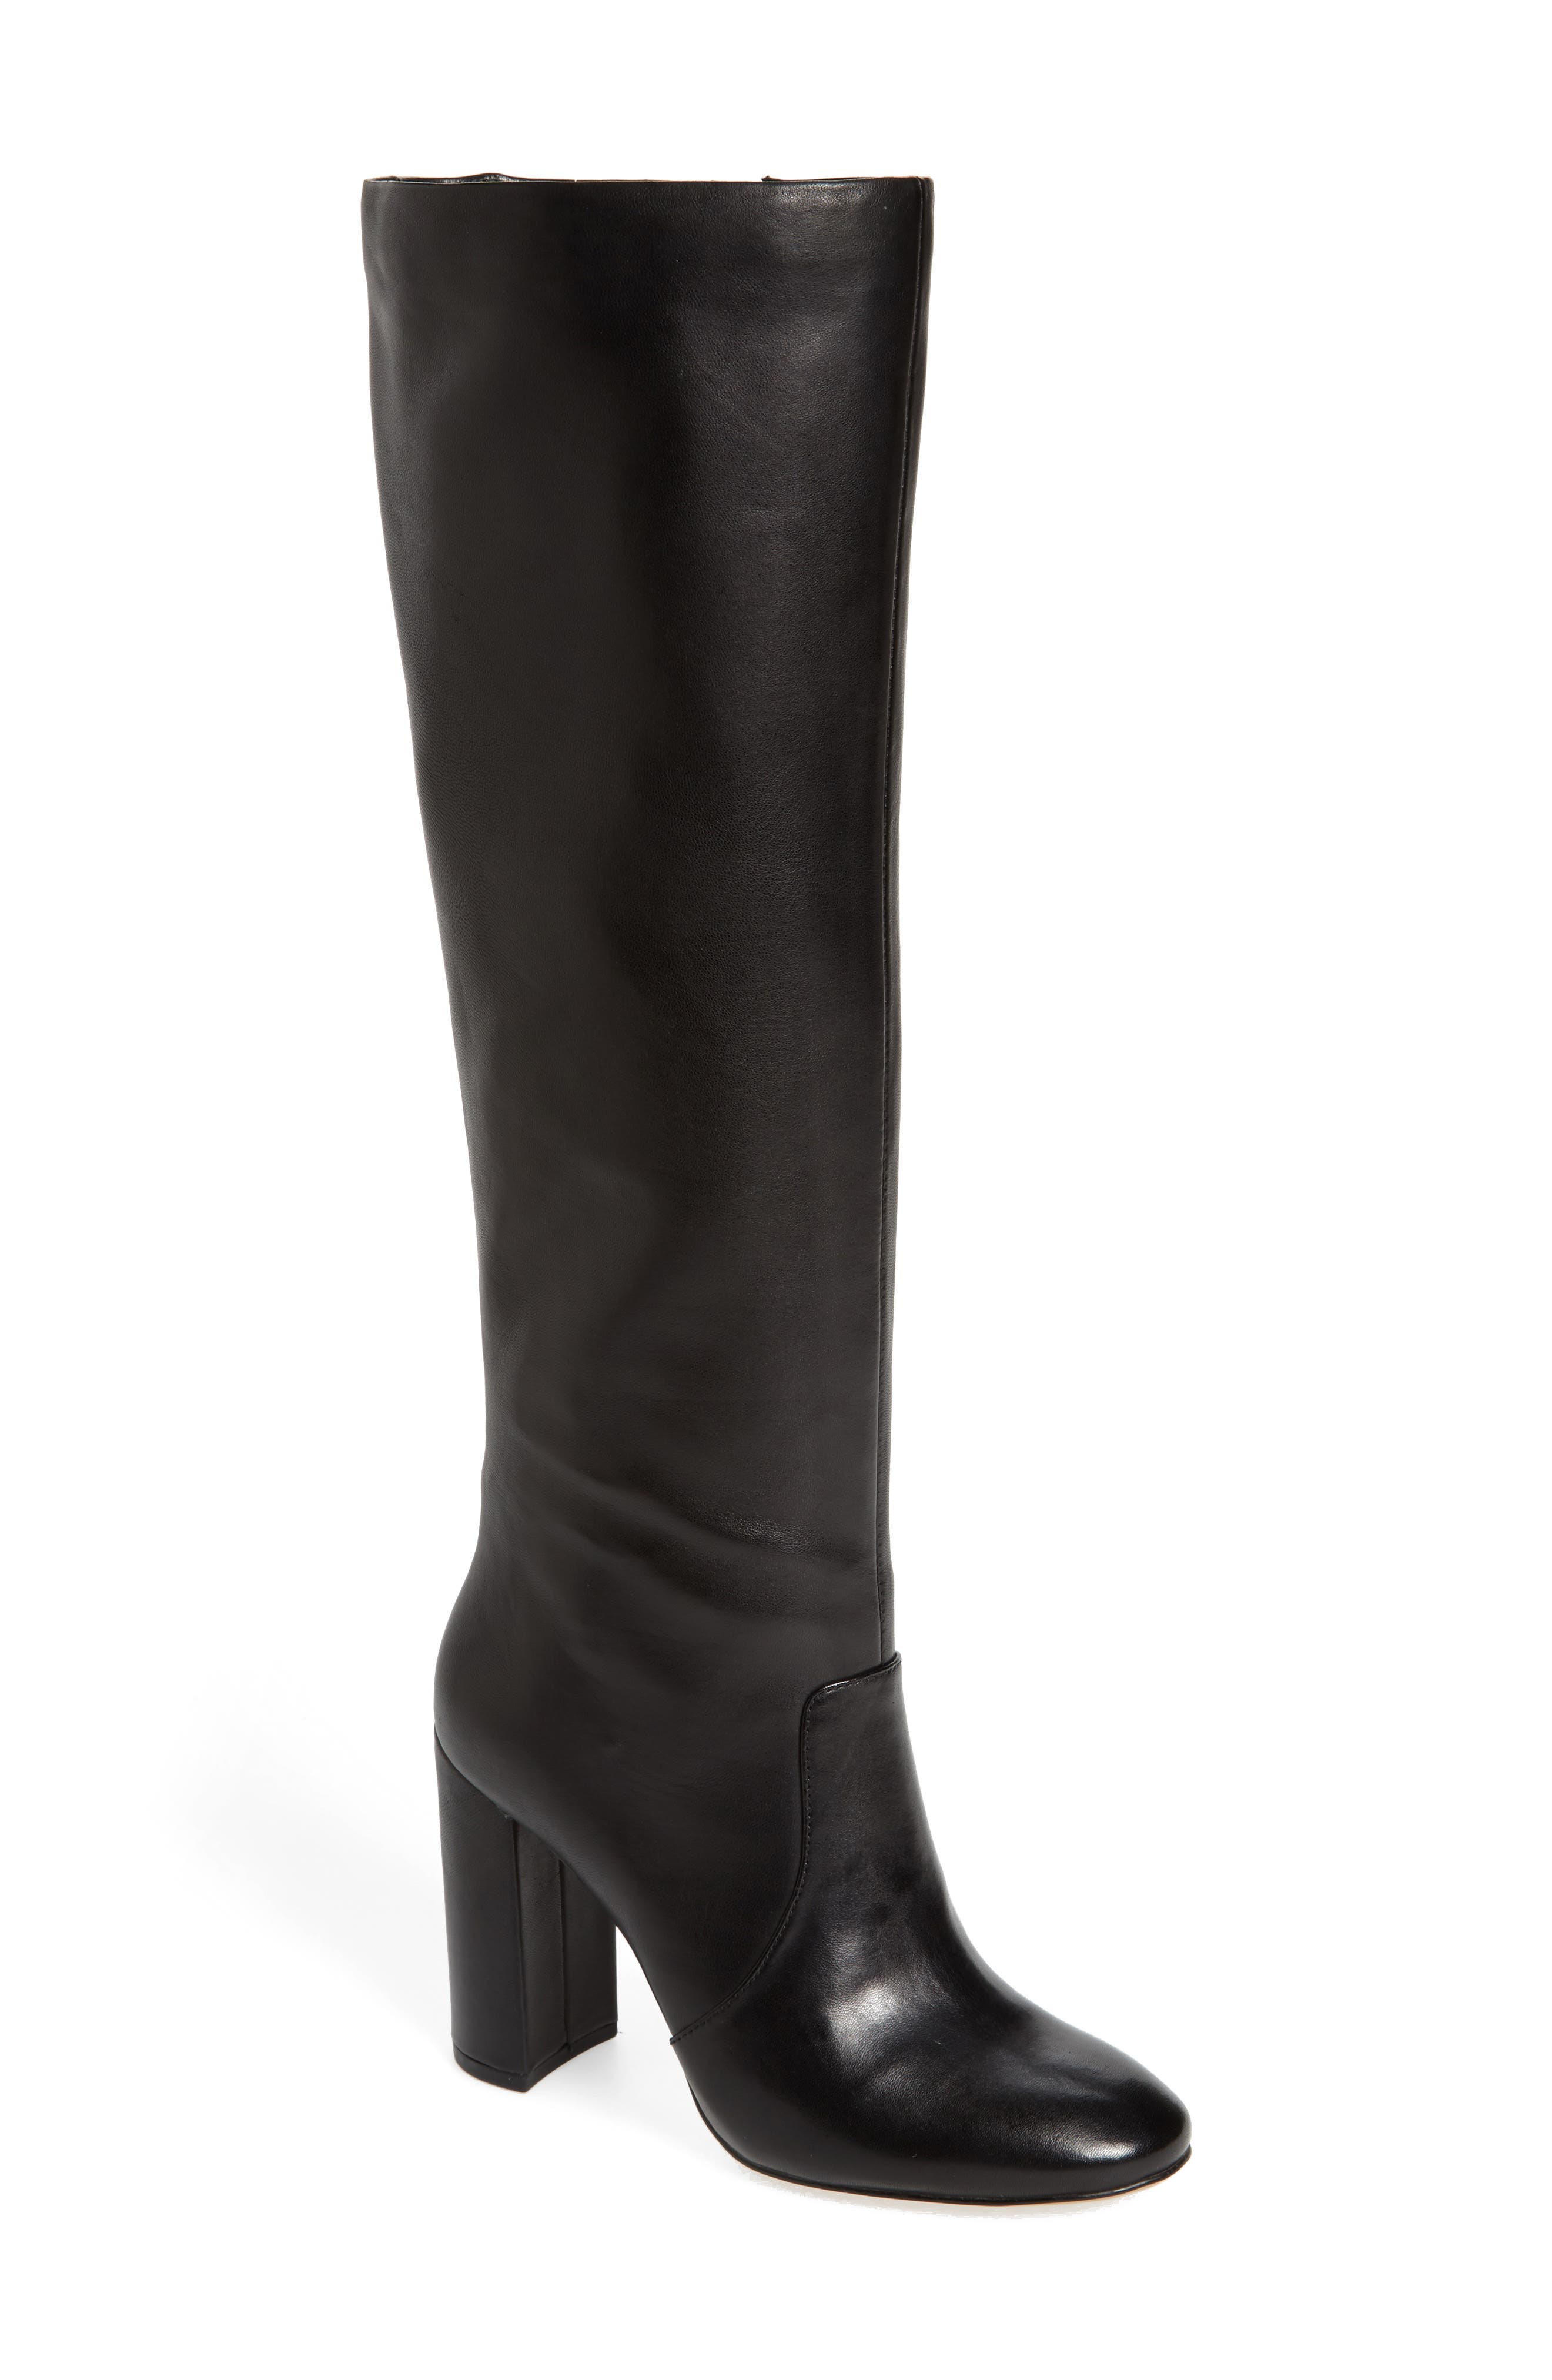 Main Image - Botkier Roslin Knee High Boot (Women)